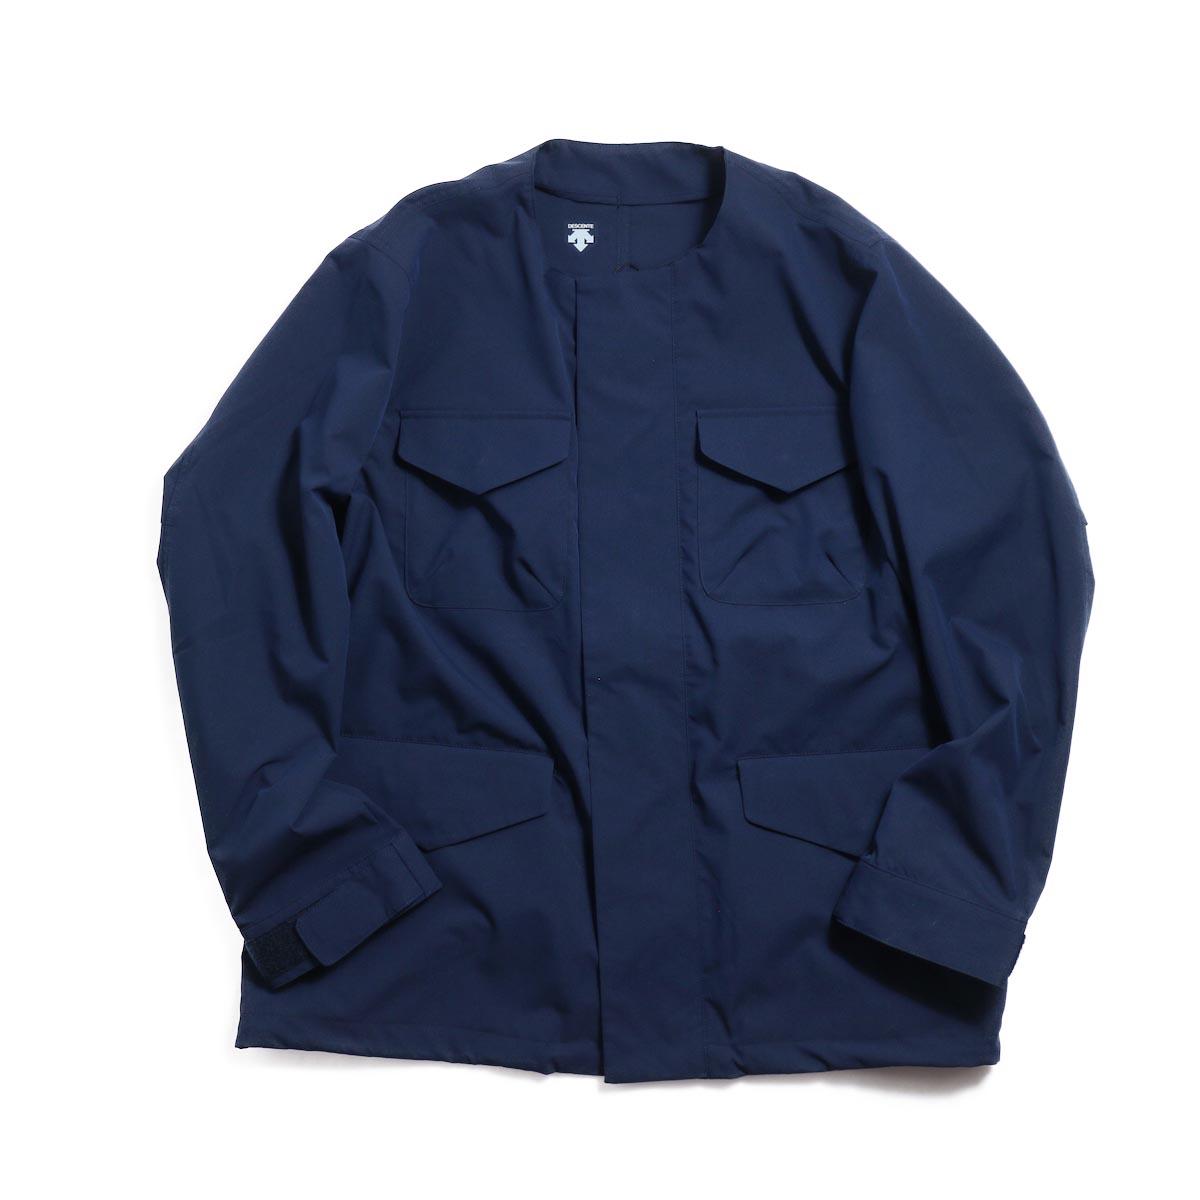 DESCENTE ddd / Utility Jacket -Navy